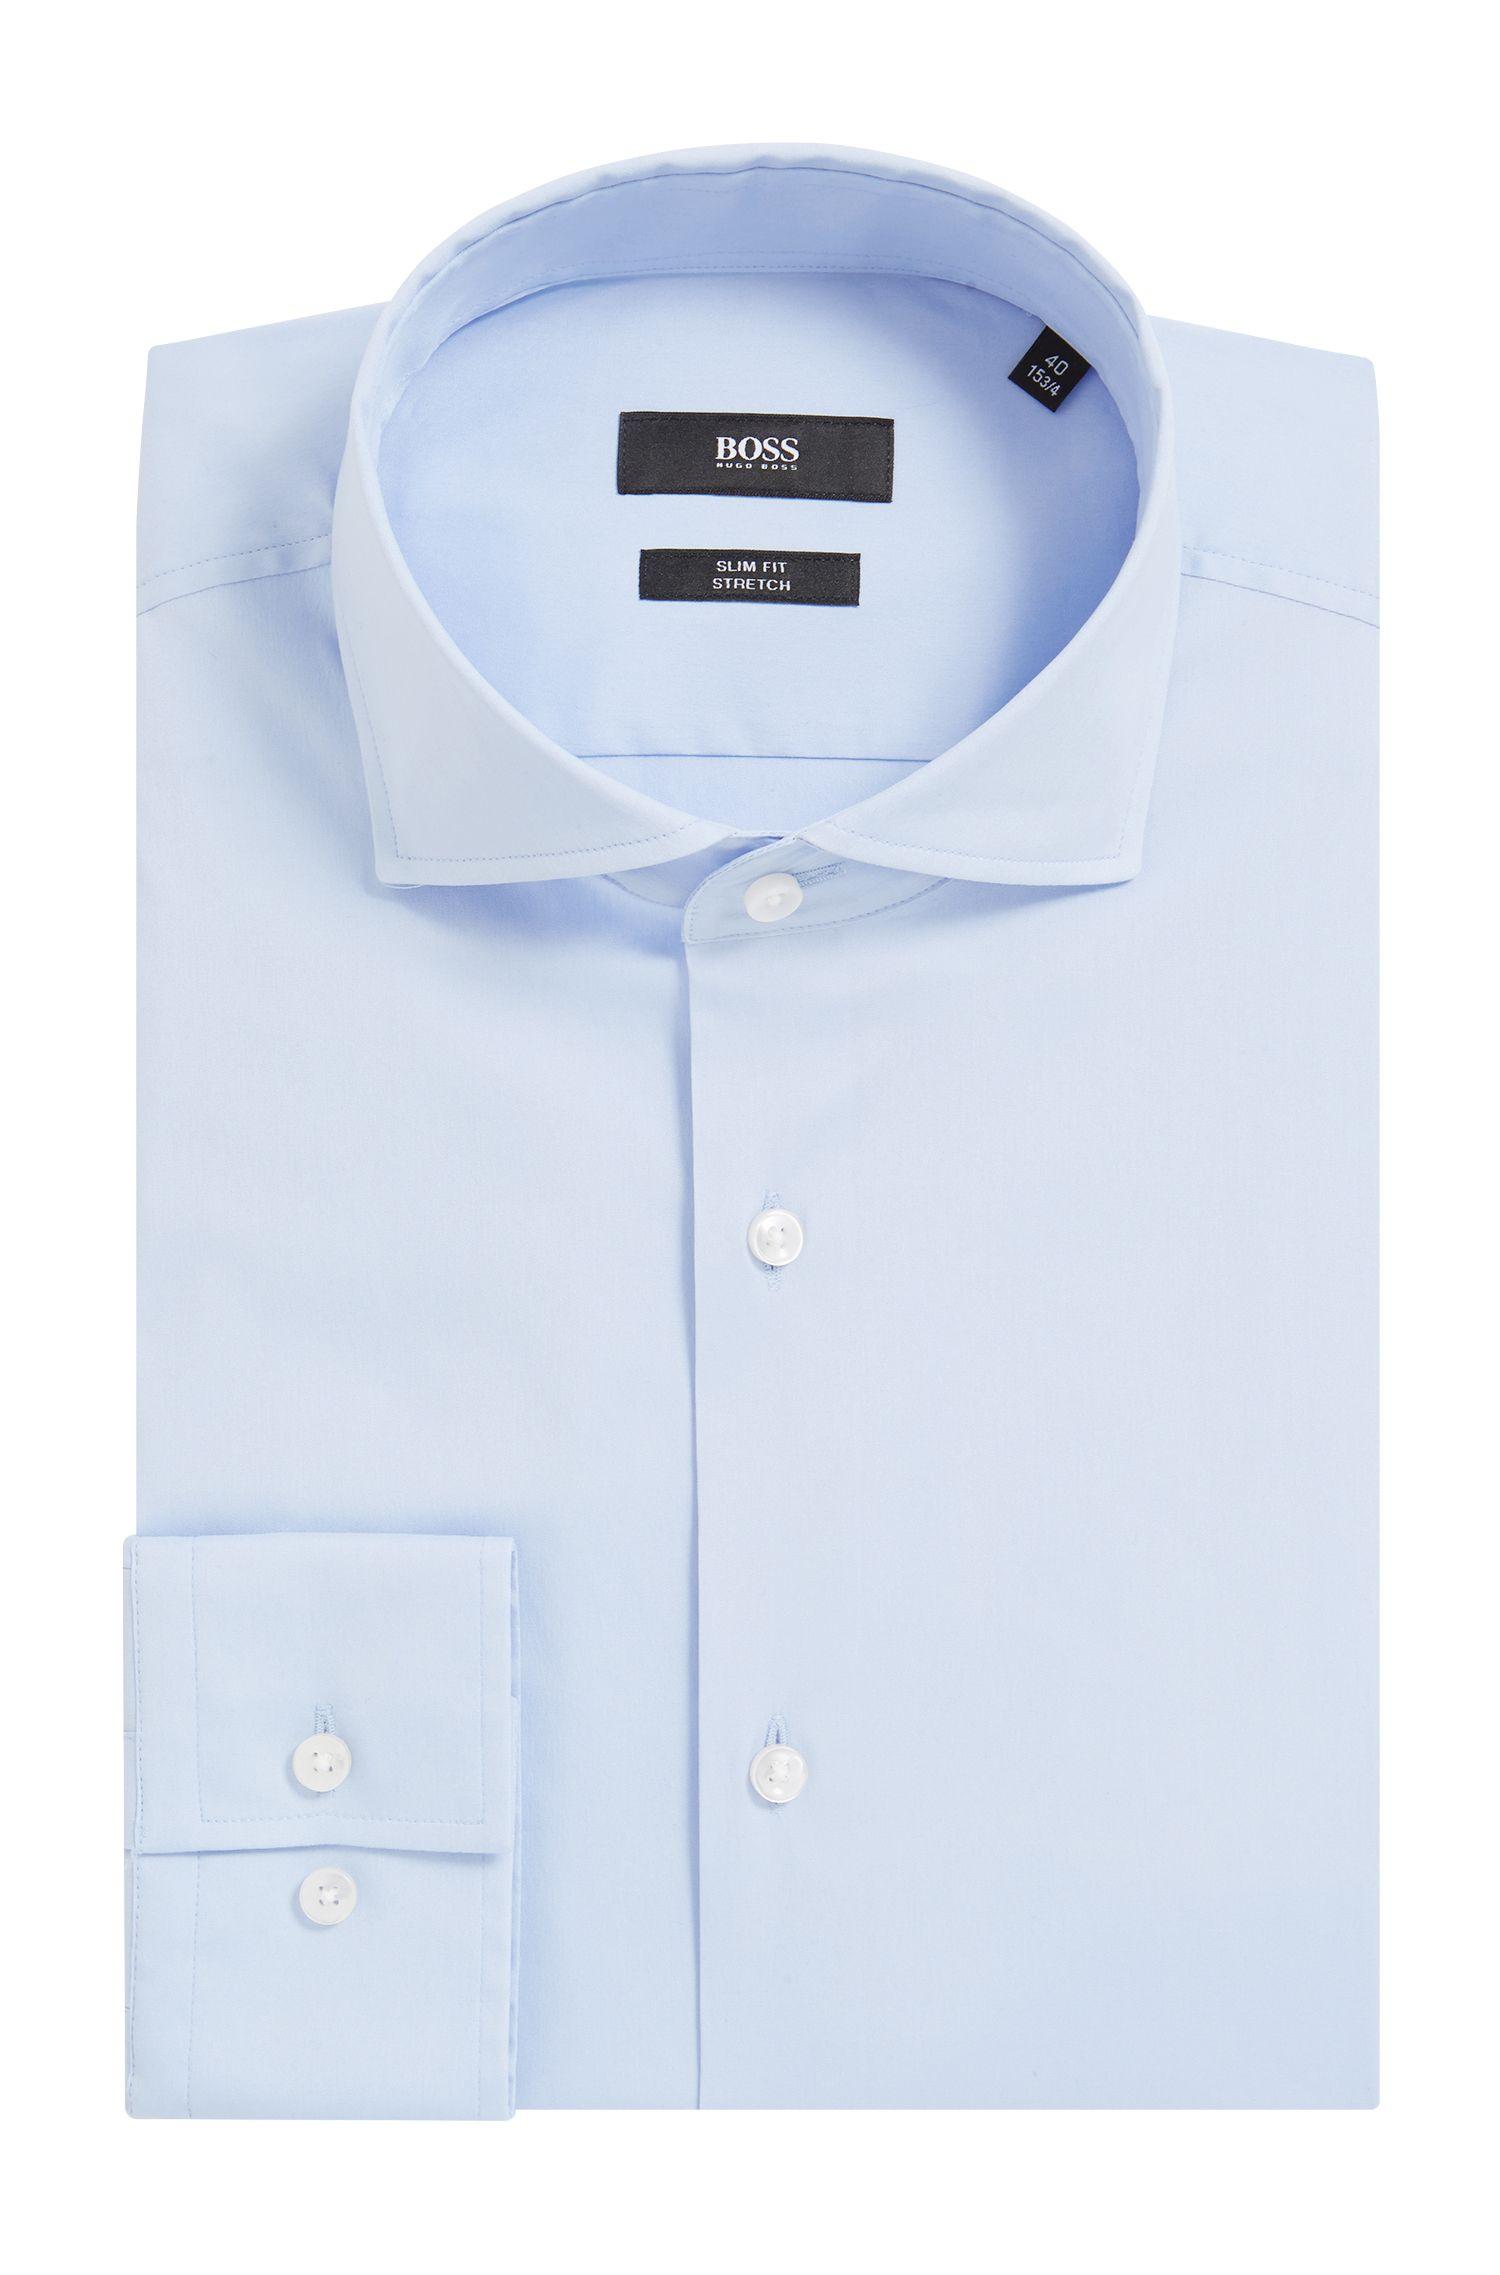 Spread Collar Stretch Cotton Dress Shirt, Slim Fit | Jason